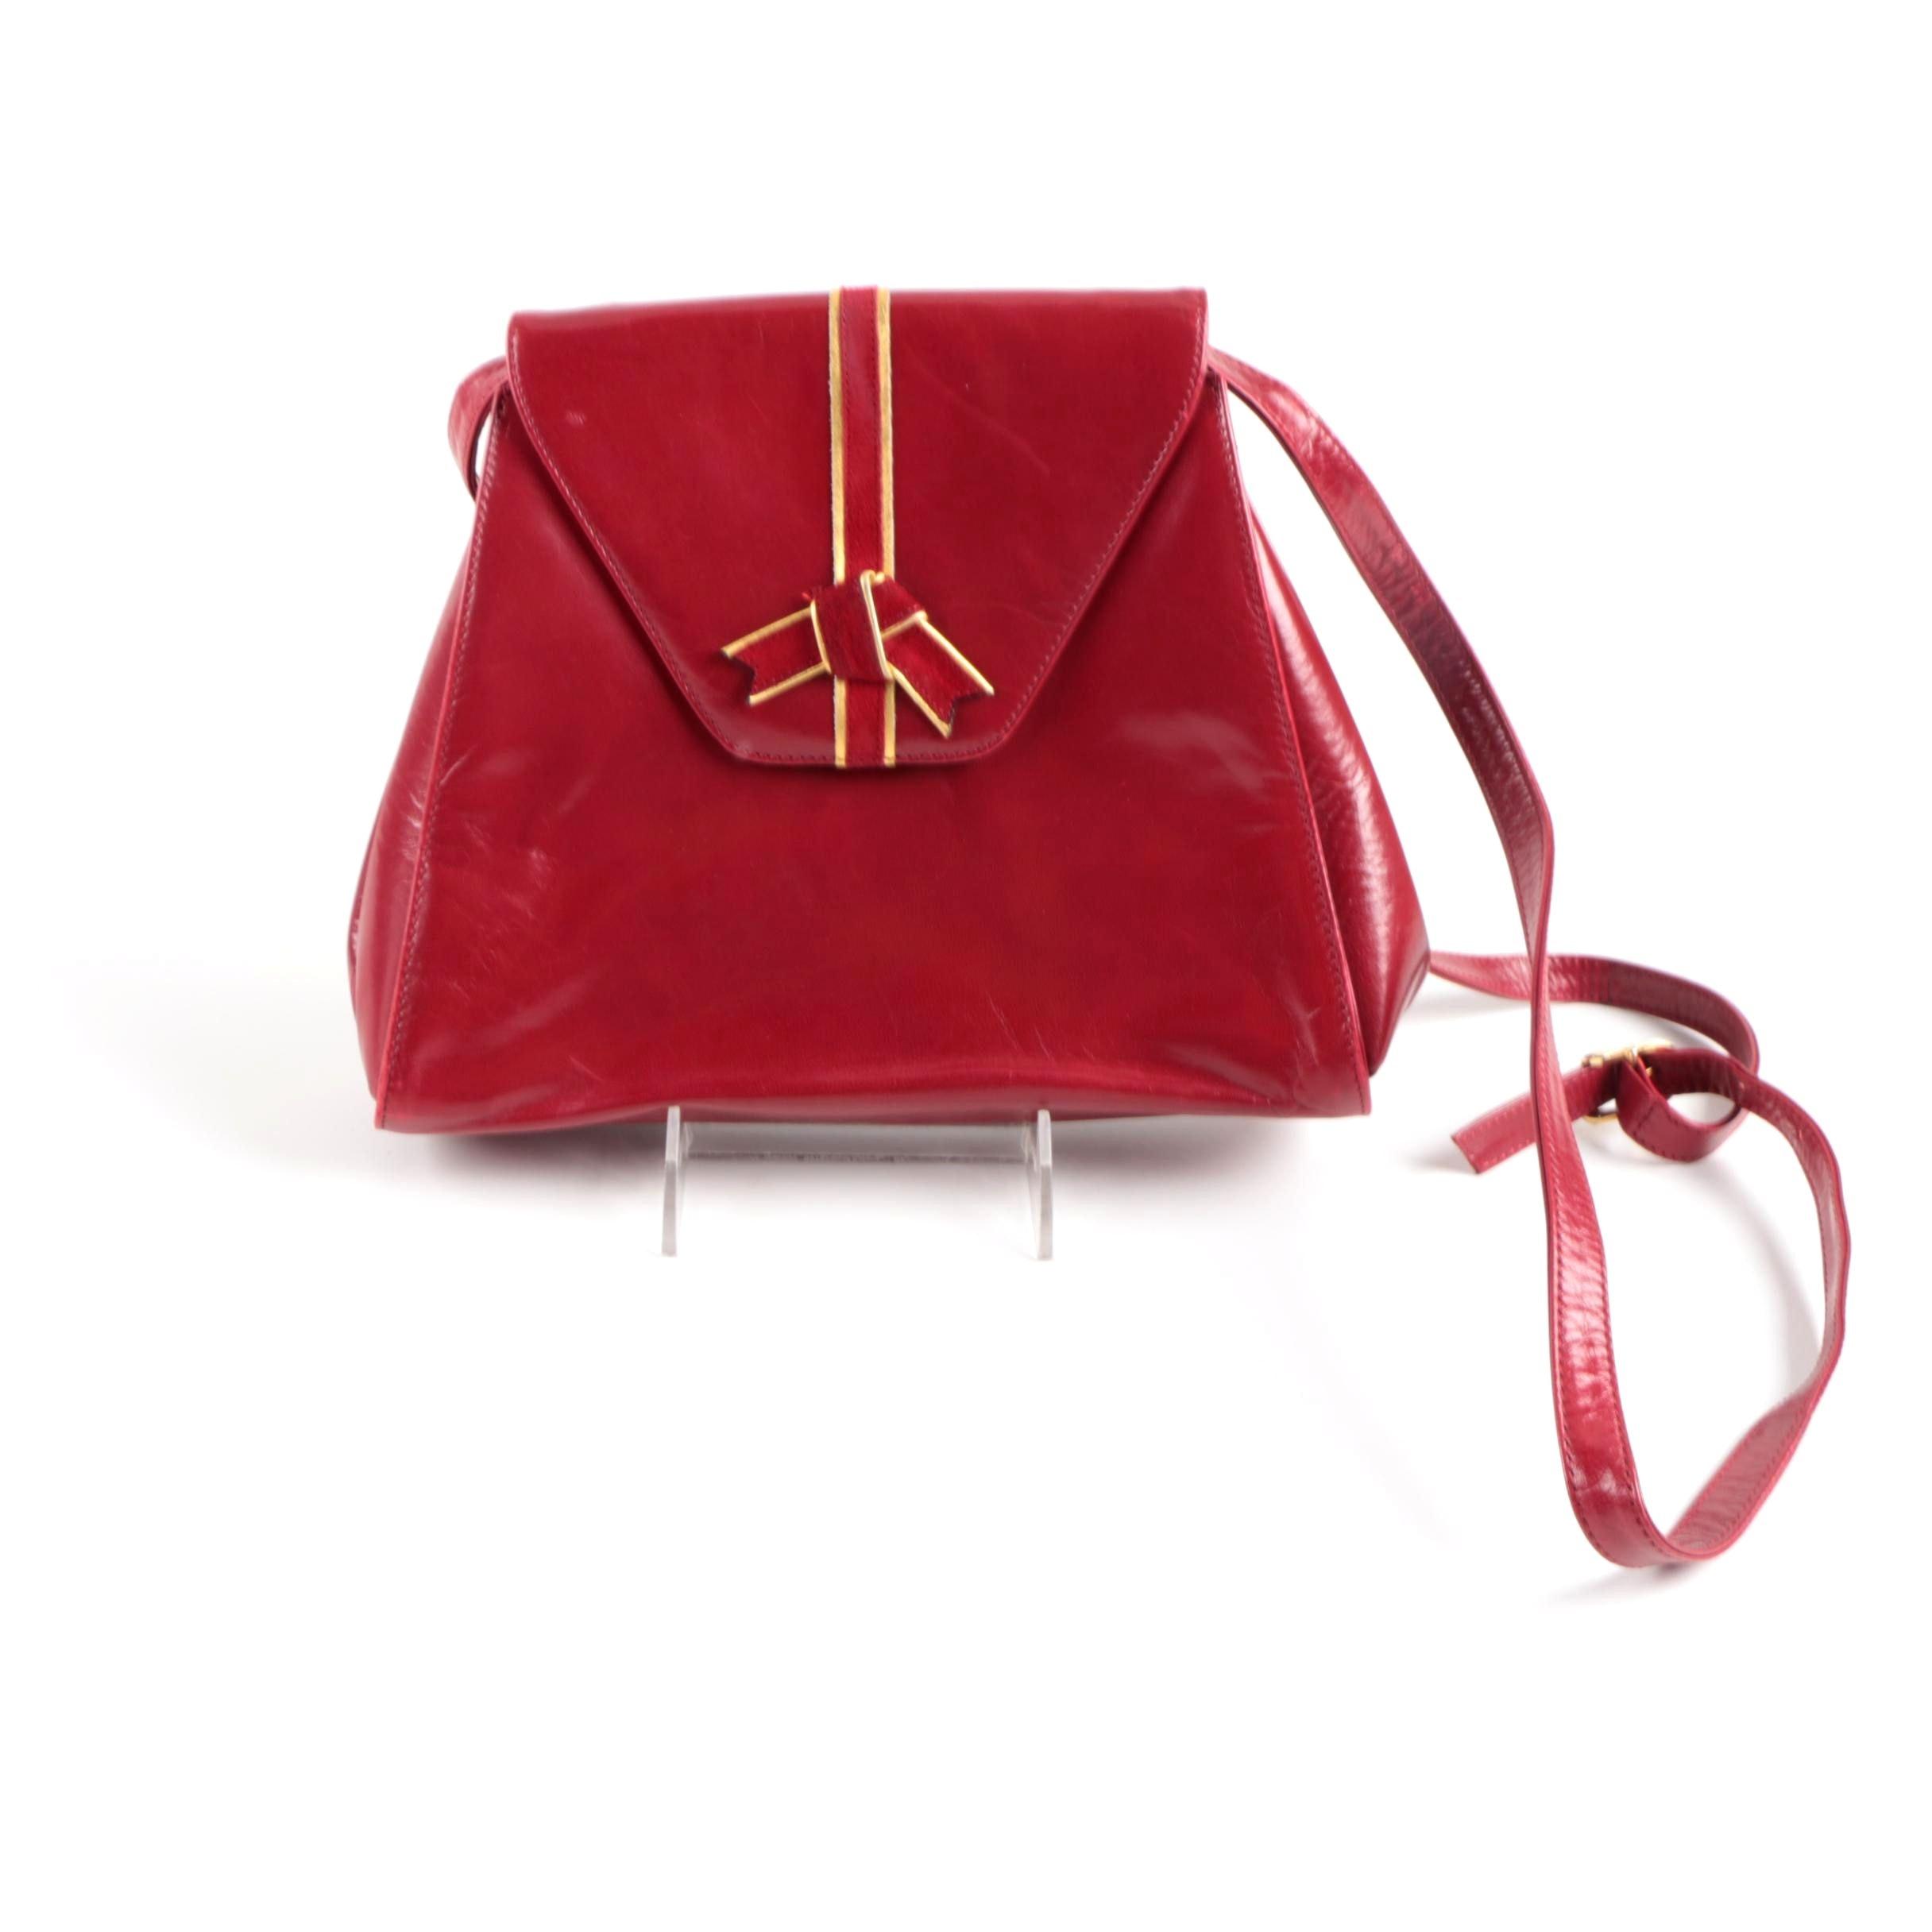 Vintage Red Leather Bally Handbag